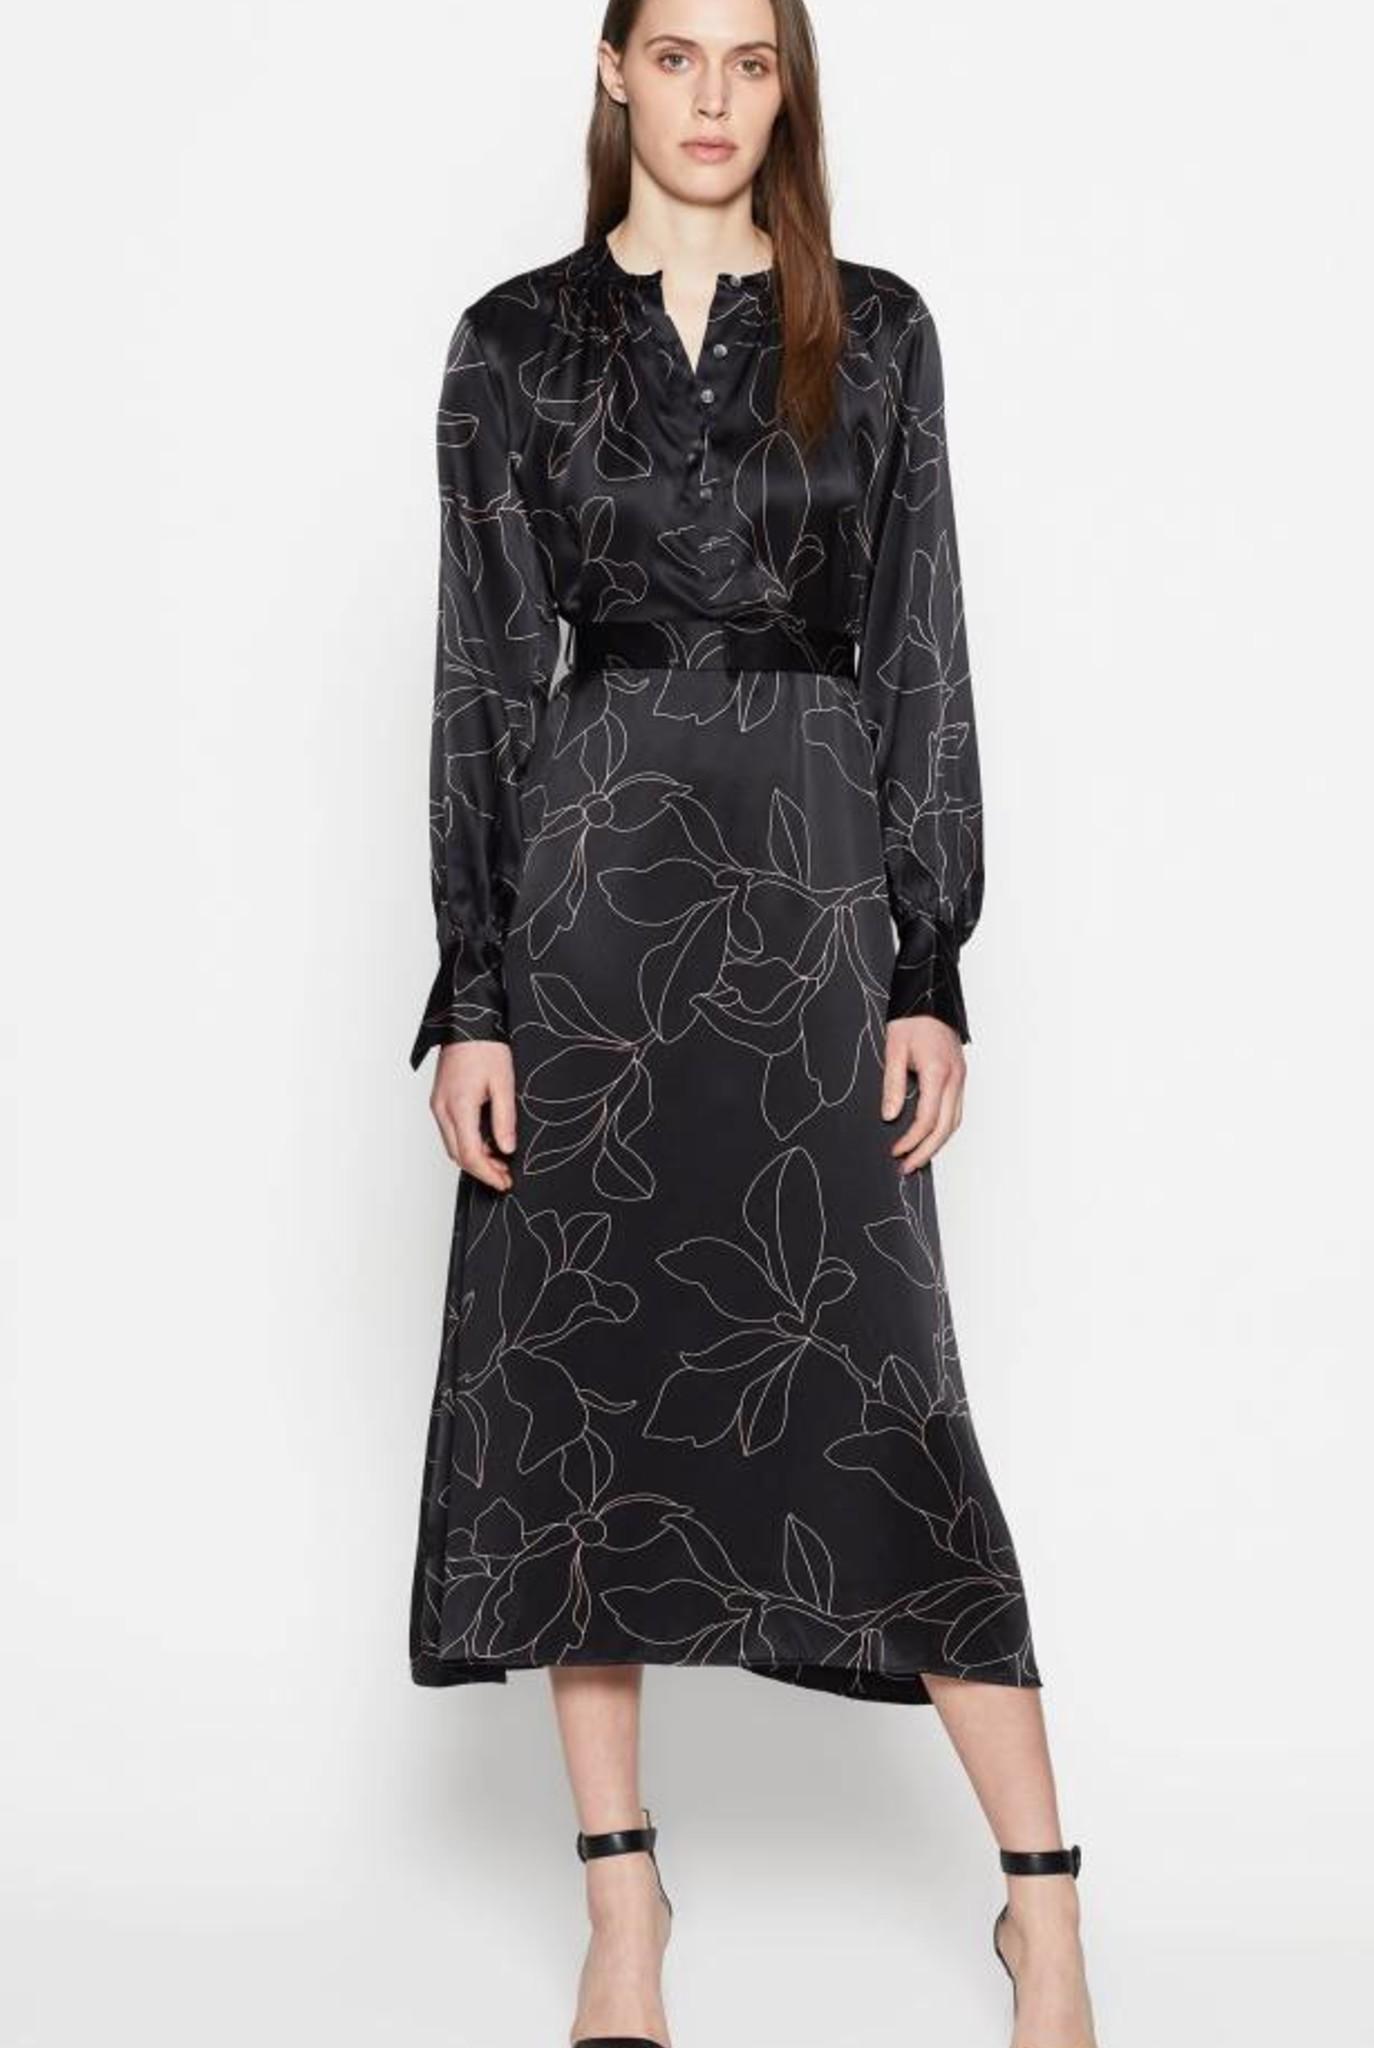 Alowette dress  true black flamant rose